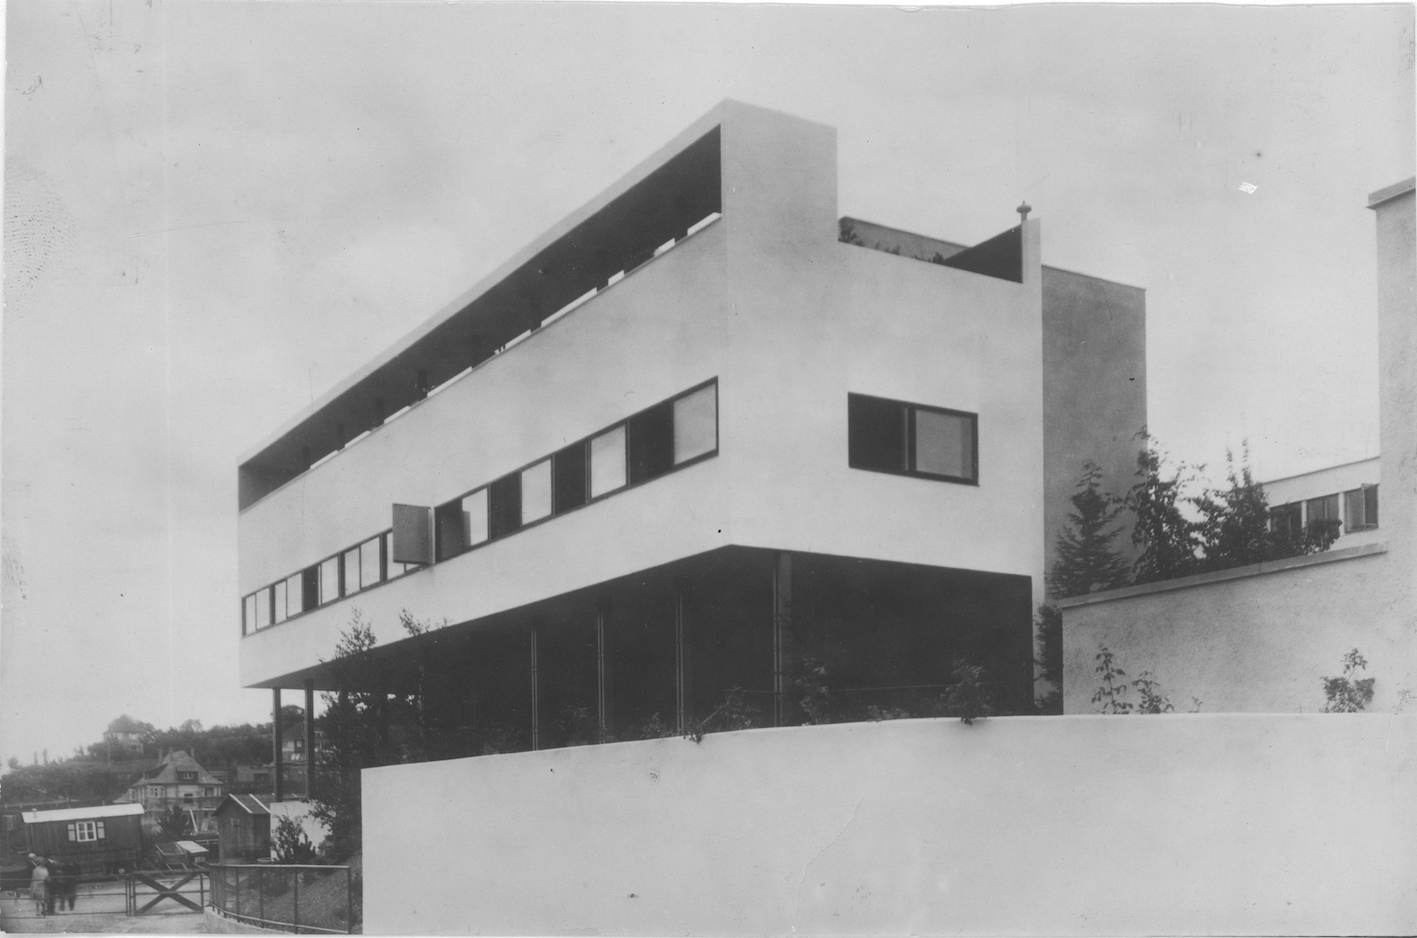 Le Corbusier, Pierre Jeanneret, Maison Weissenhoff.